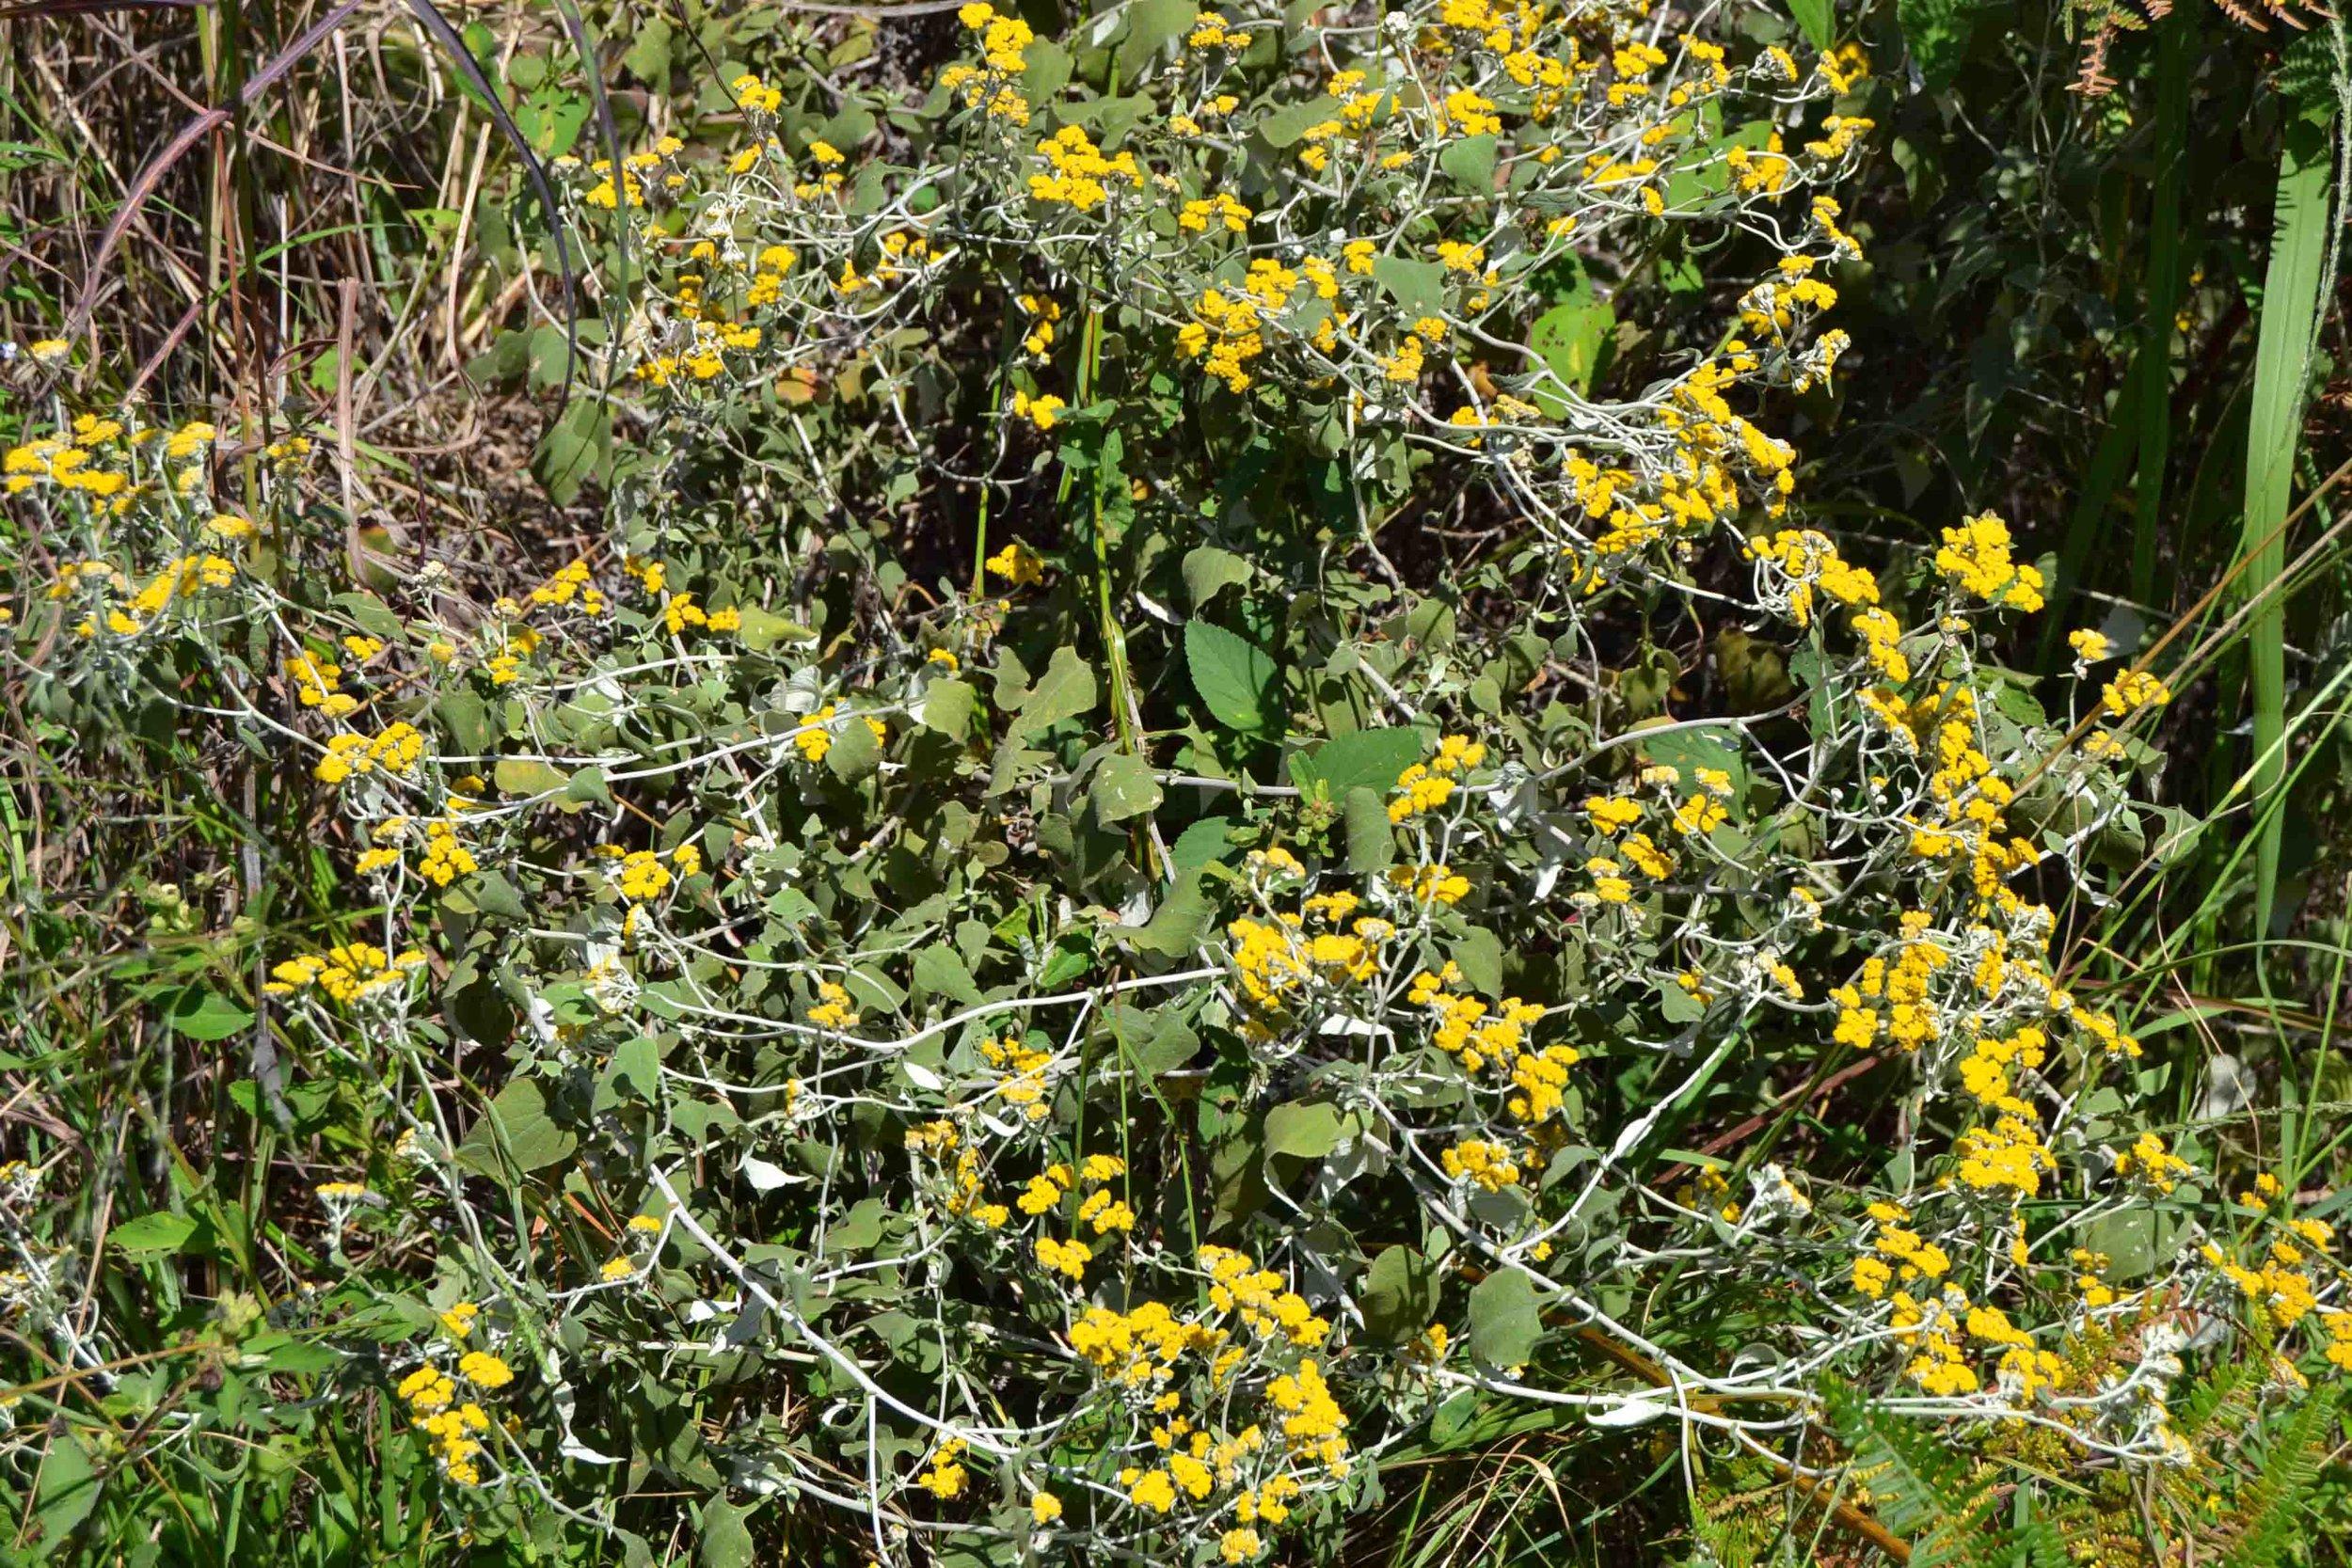 Helichrysum hypoleucum  - likes a bit of shade